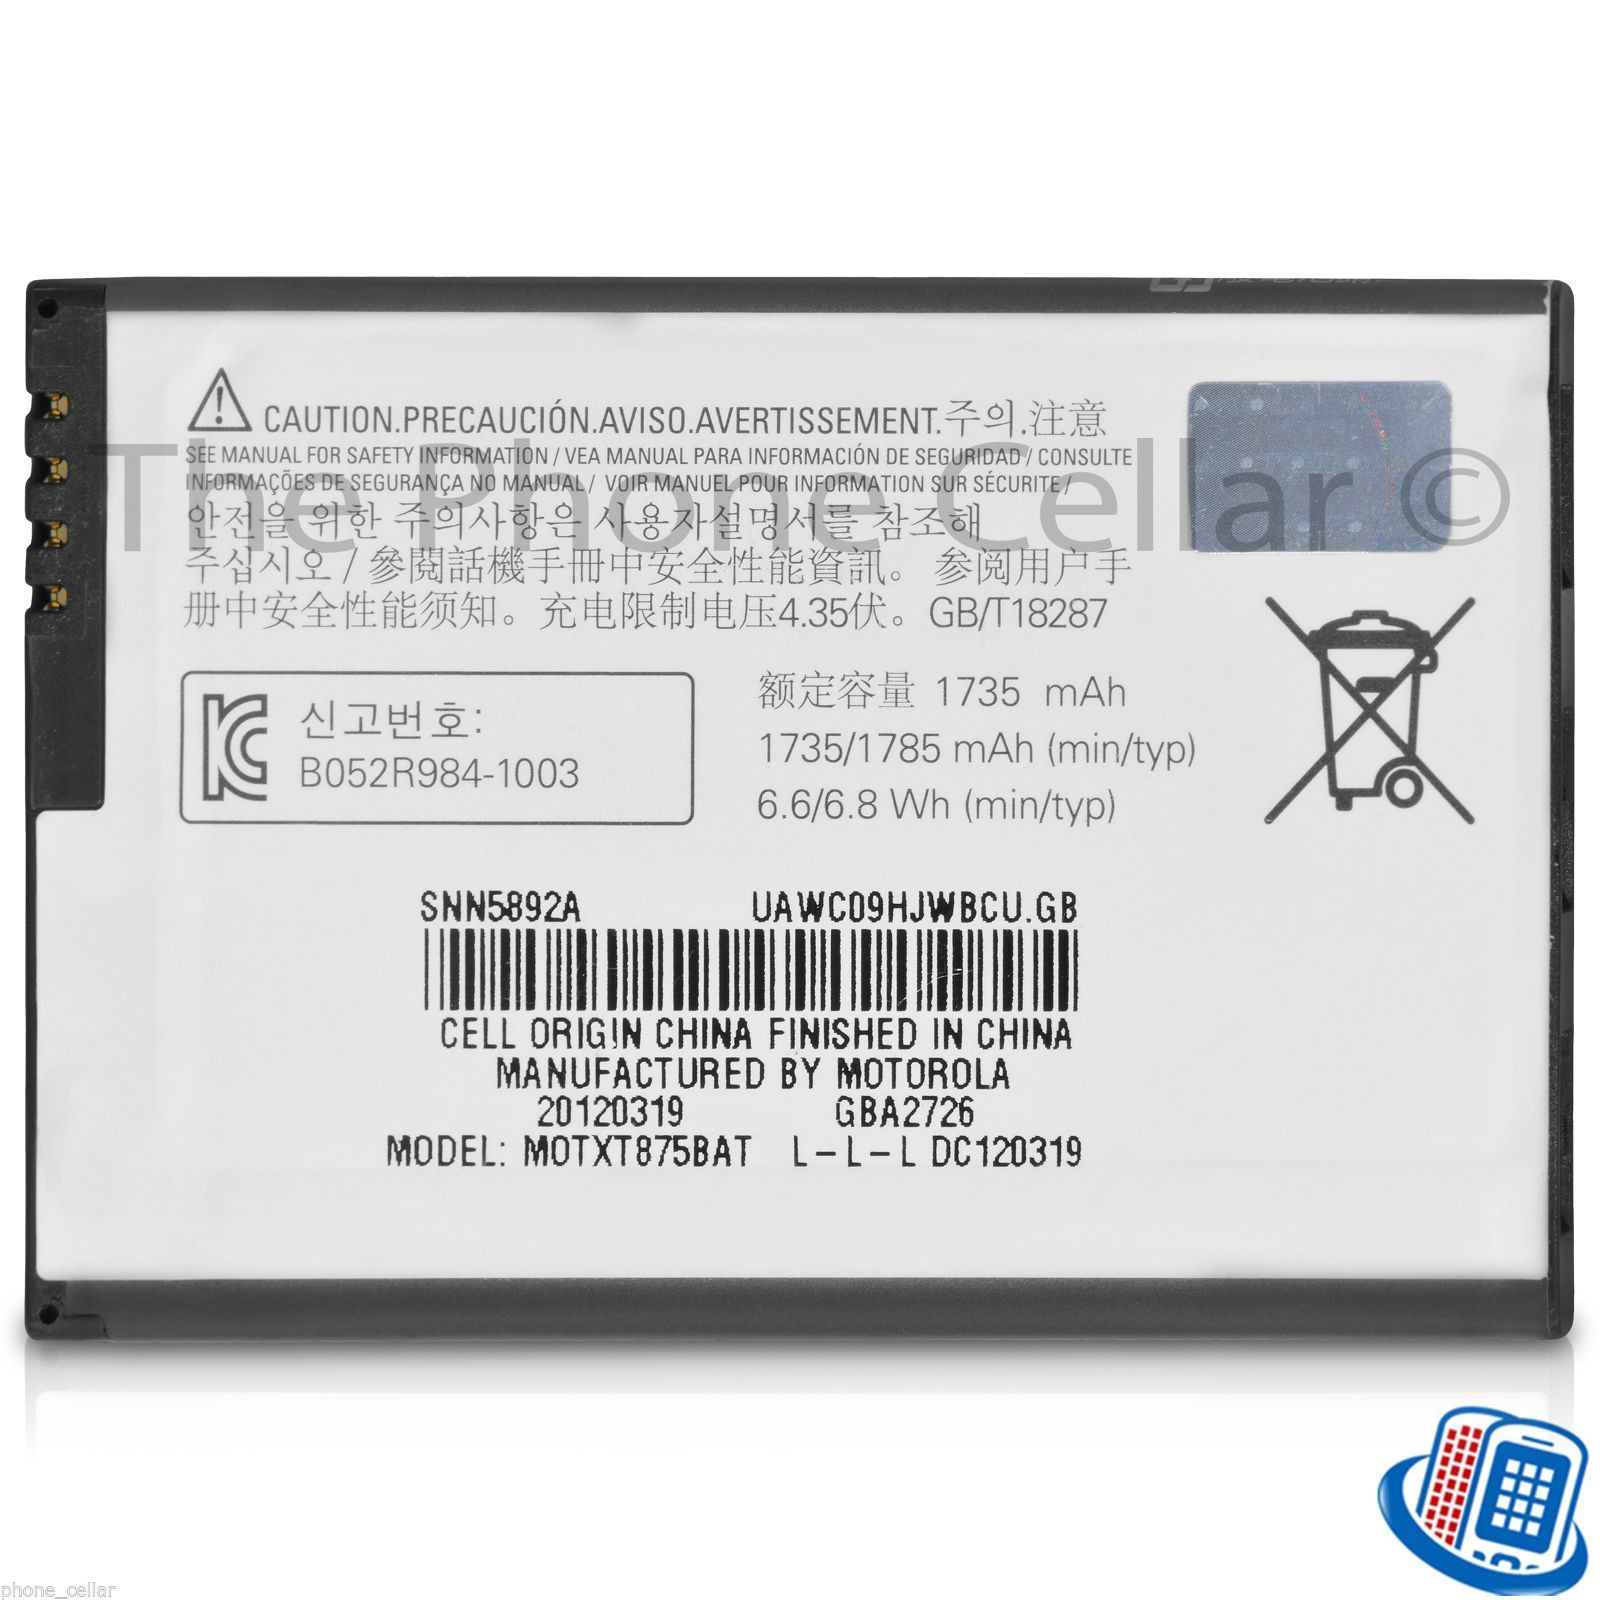 Artech Mesin Recording Ar 1003 Lihat Daftar Harga Terbaru Dan Ar100 Phone Ampamp Pabx Personal Voice Manager New Oem Motorola Hw4x Battery For Xt875 Droid Bionic Atrix 2 Mb865